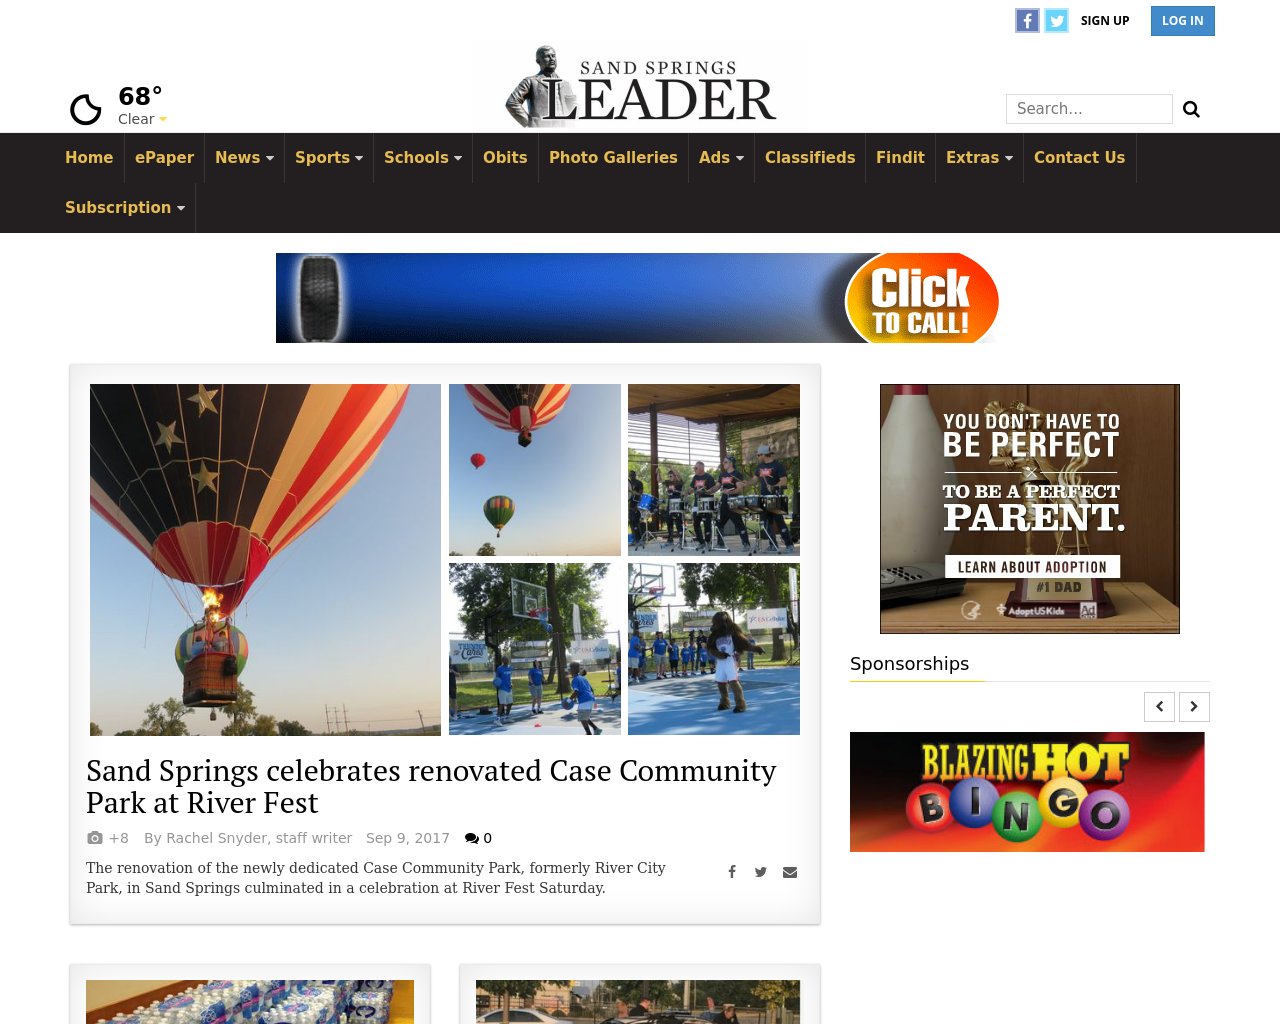 Sand-Springs-Leader-Advertising-Reviews-Pricing